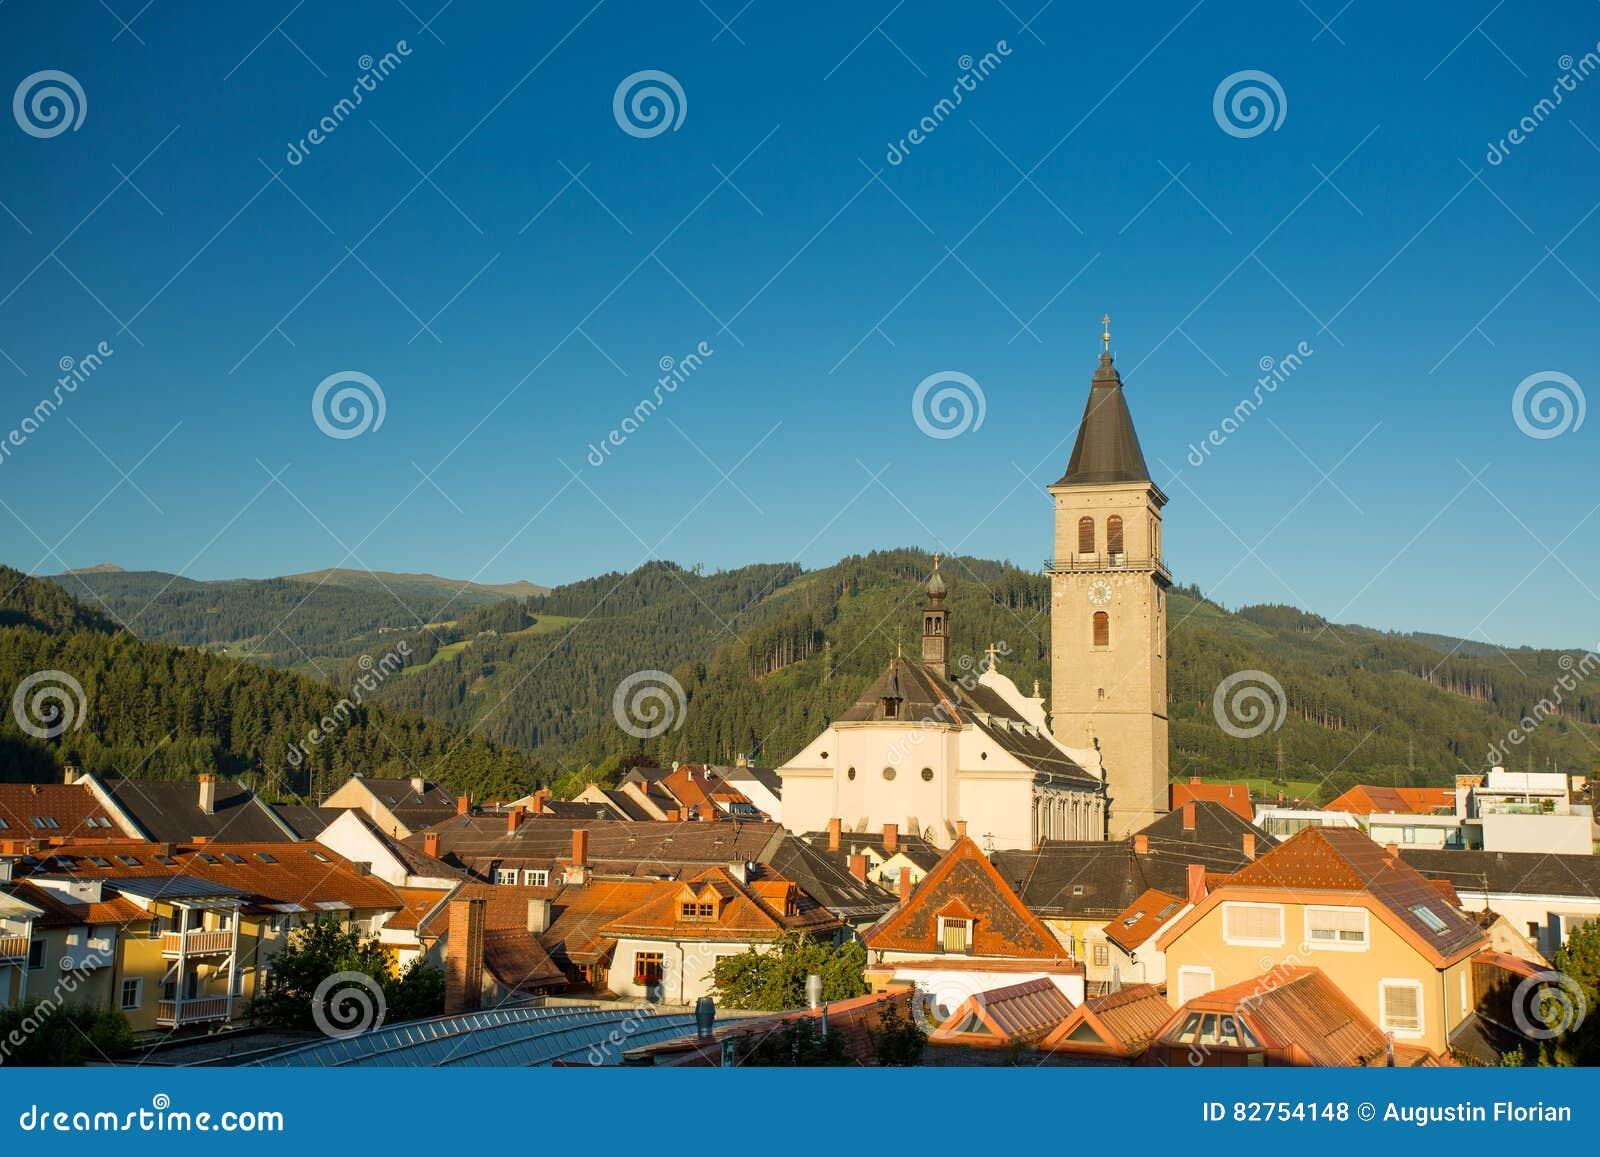 Judenburg, Austria